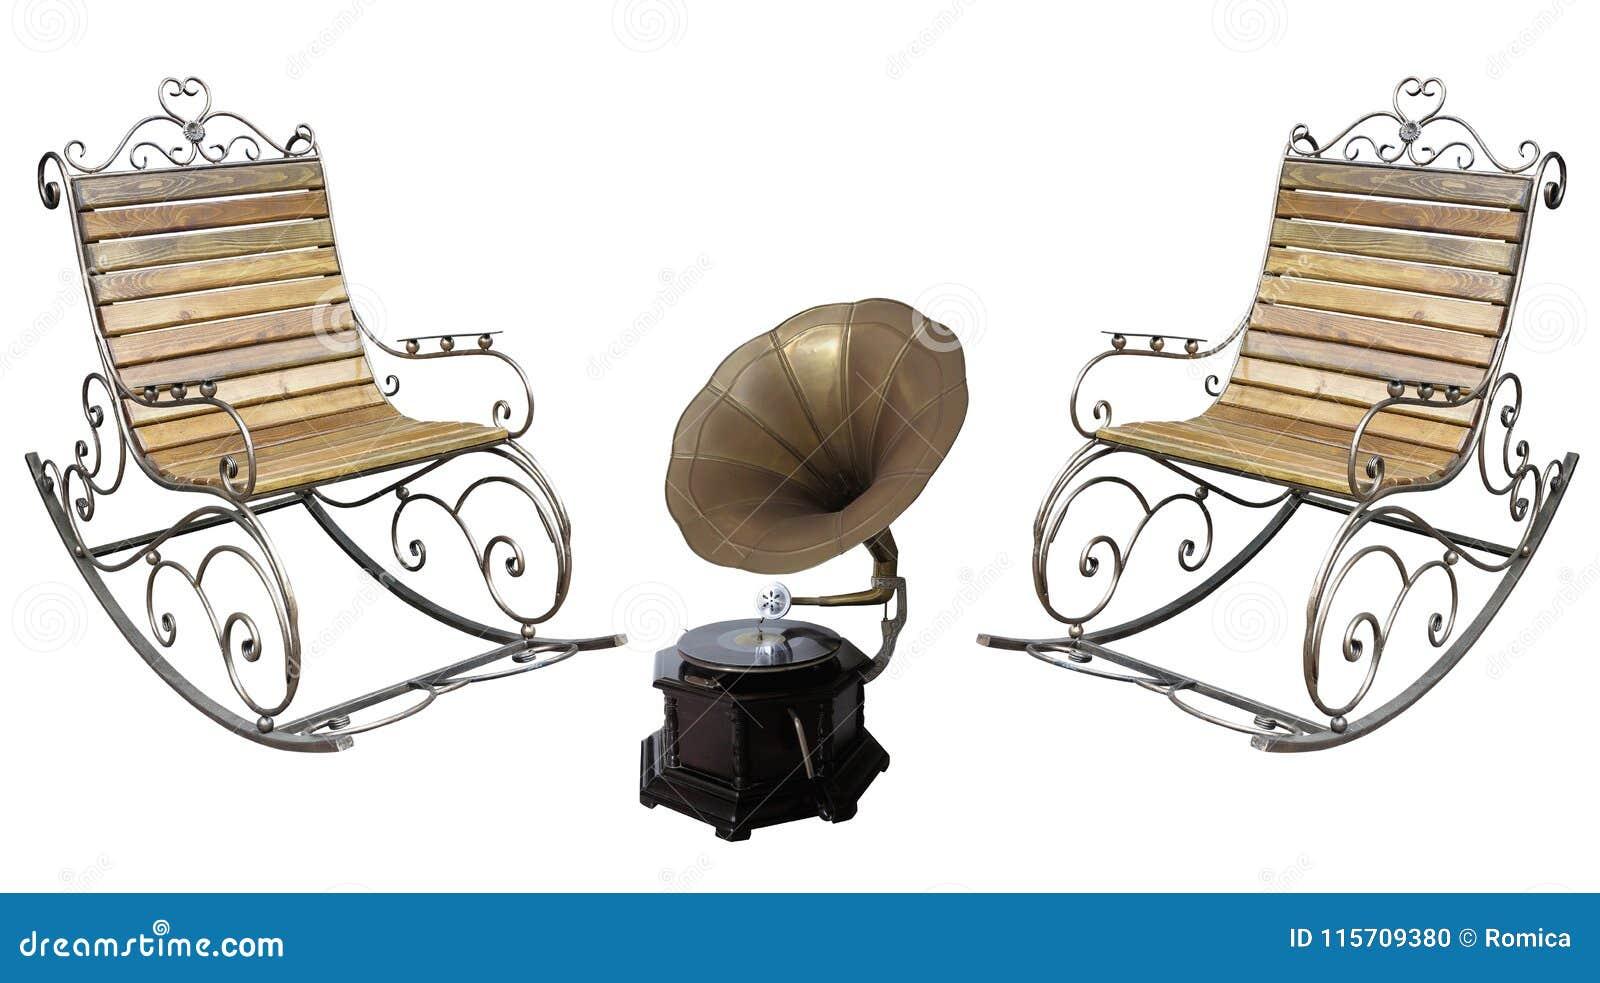 Cadeira do metall e gramofone roching forjados bonitos rec do vintage